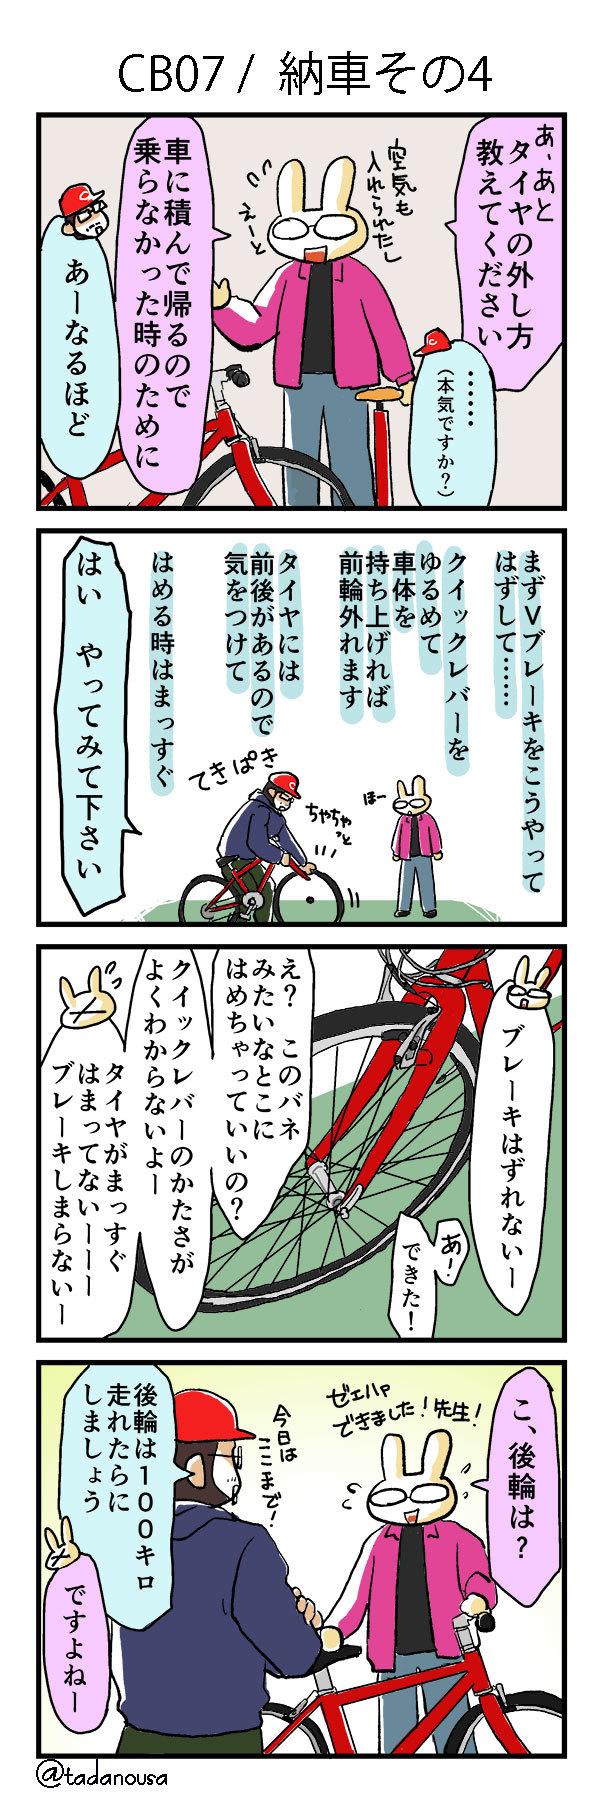 bike_4koma_kako047_s.jpg